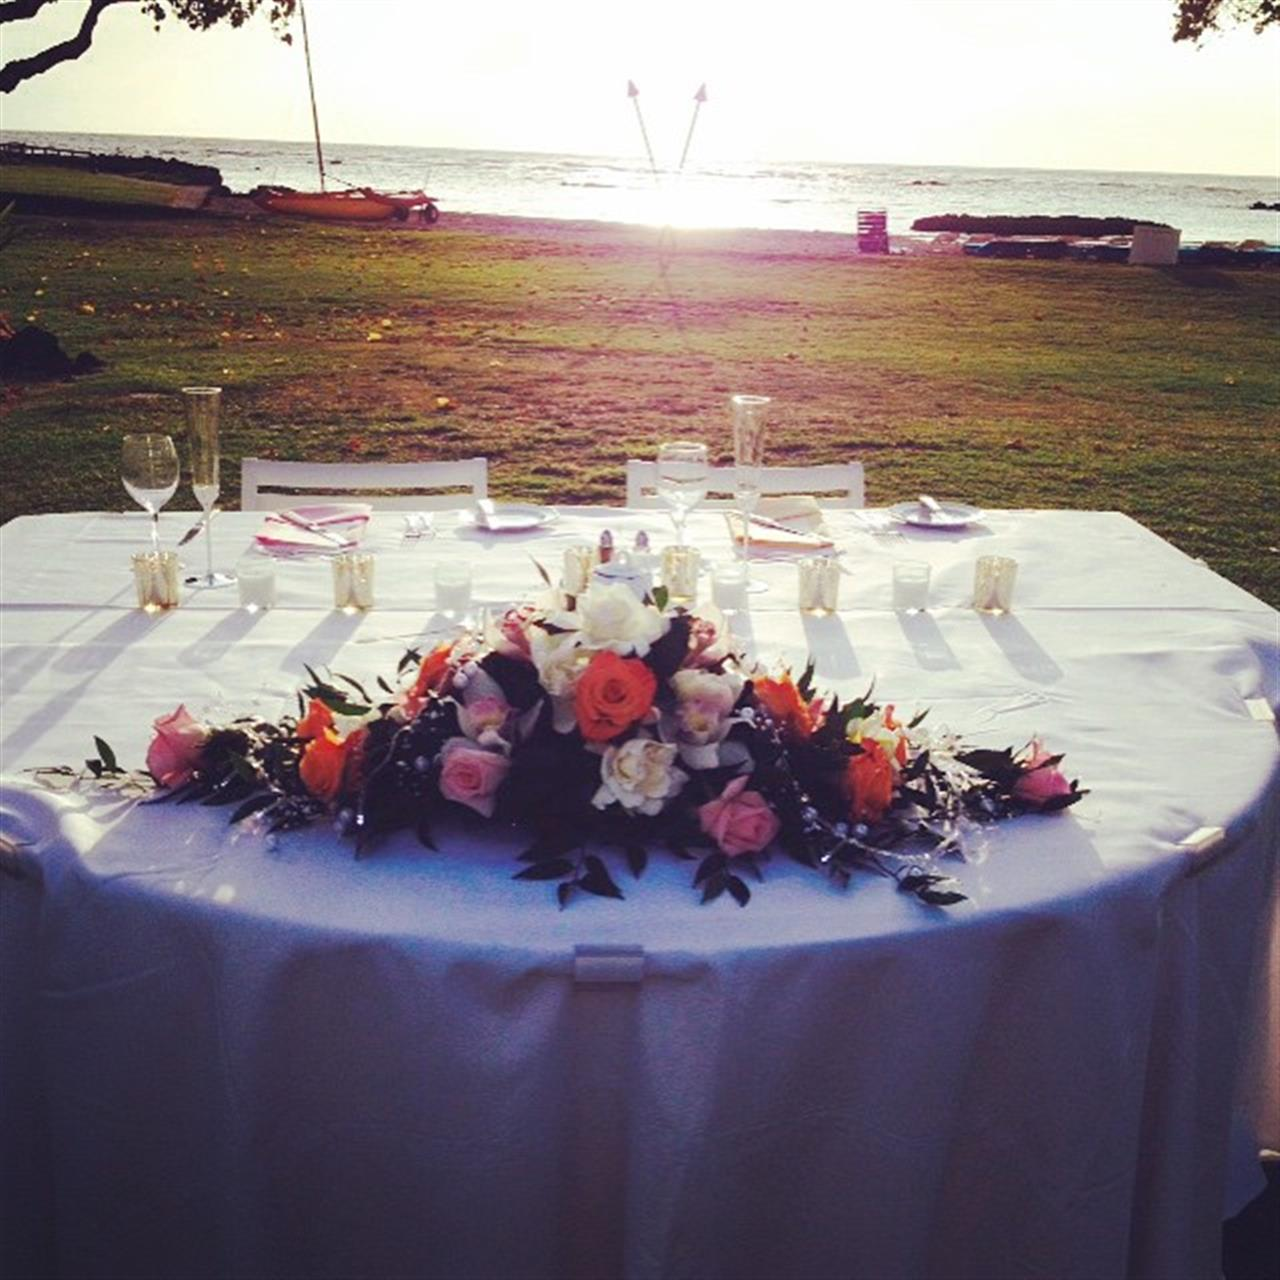 Celebrating a wedding at Mauna Lani on the Big Island... #wedding #maunalani #bigisland #leadingrelocal #???? #????? #??????